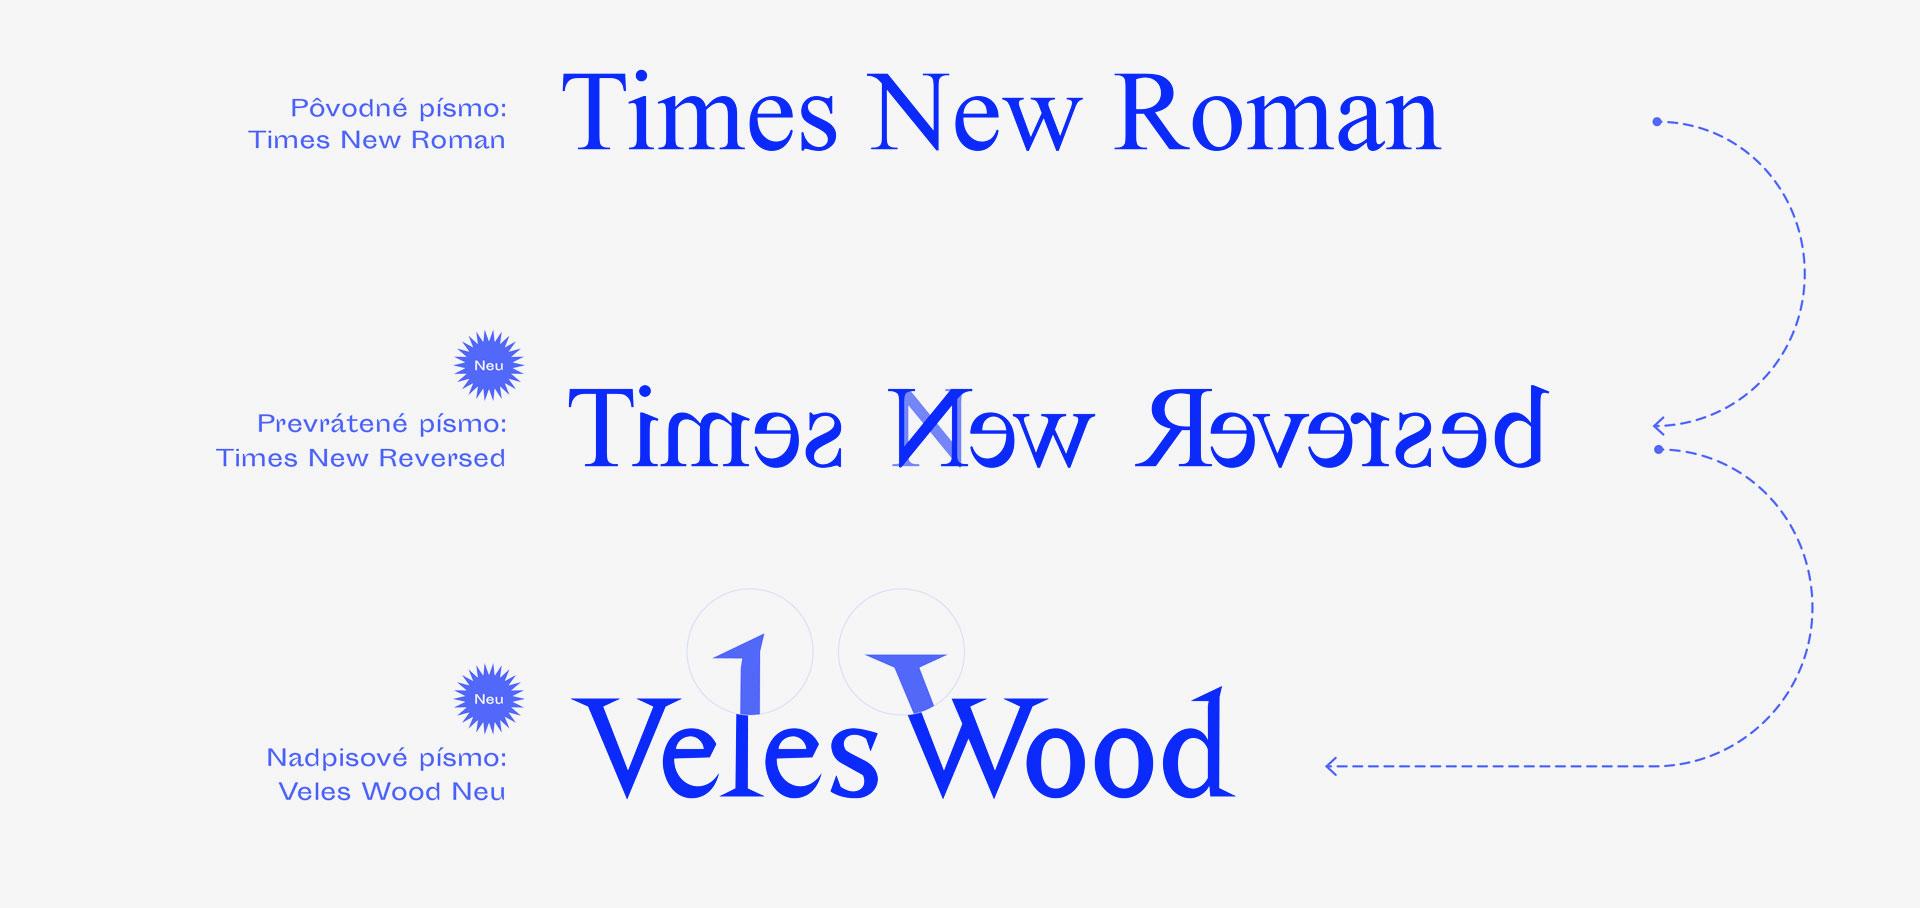 Veleswood písmo, grafický dizajn